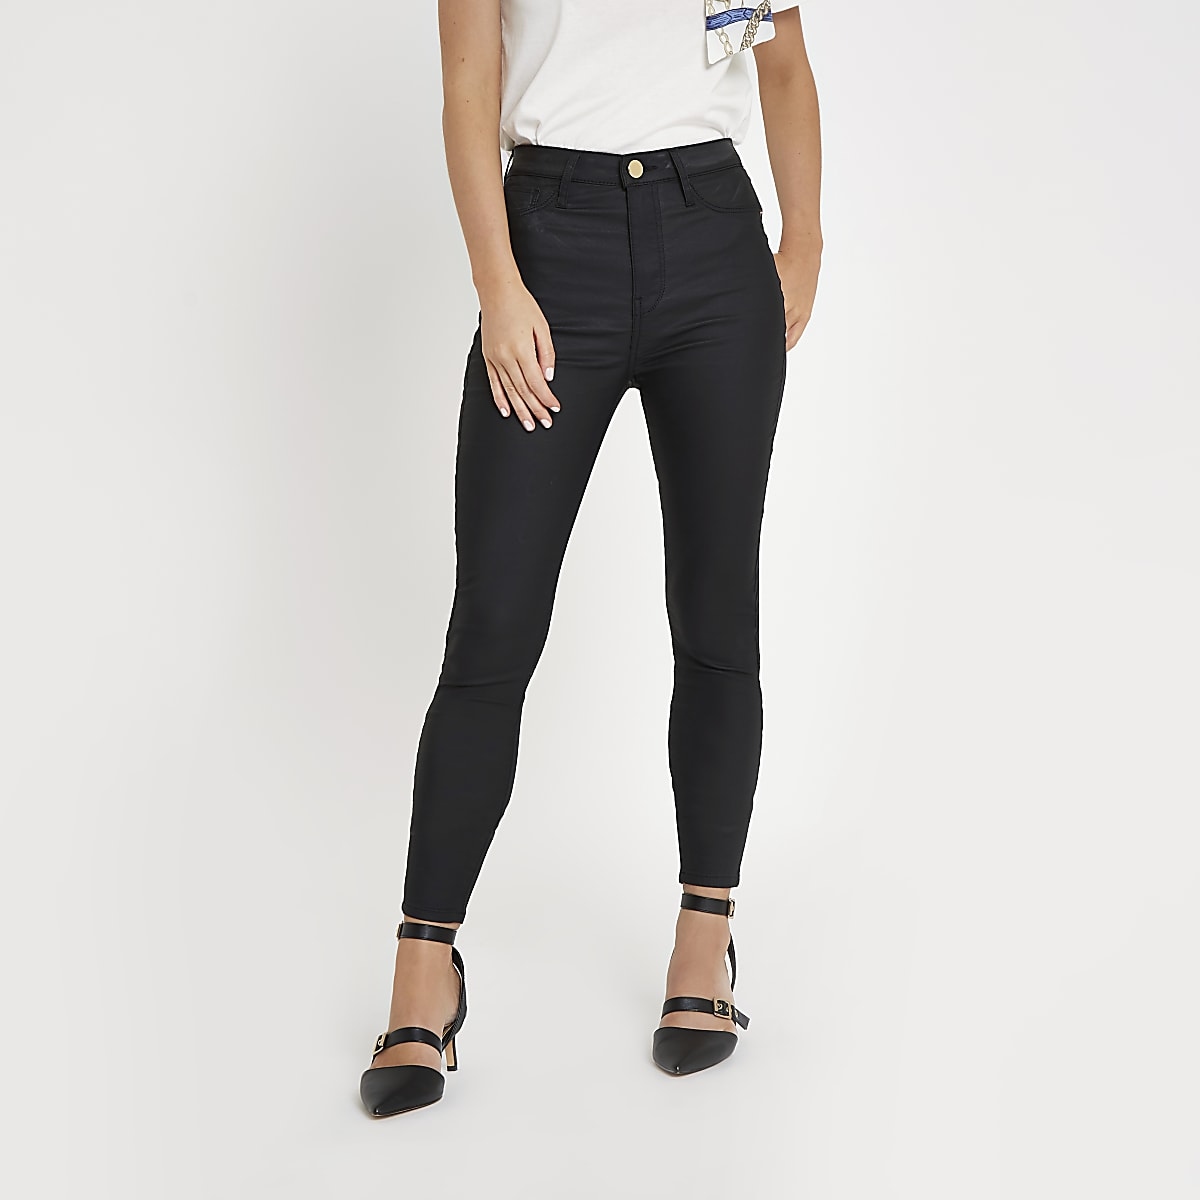 RI Petite - Harper - Zwarte jeans met hoge taille en coating